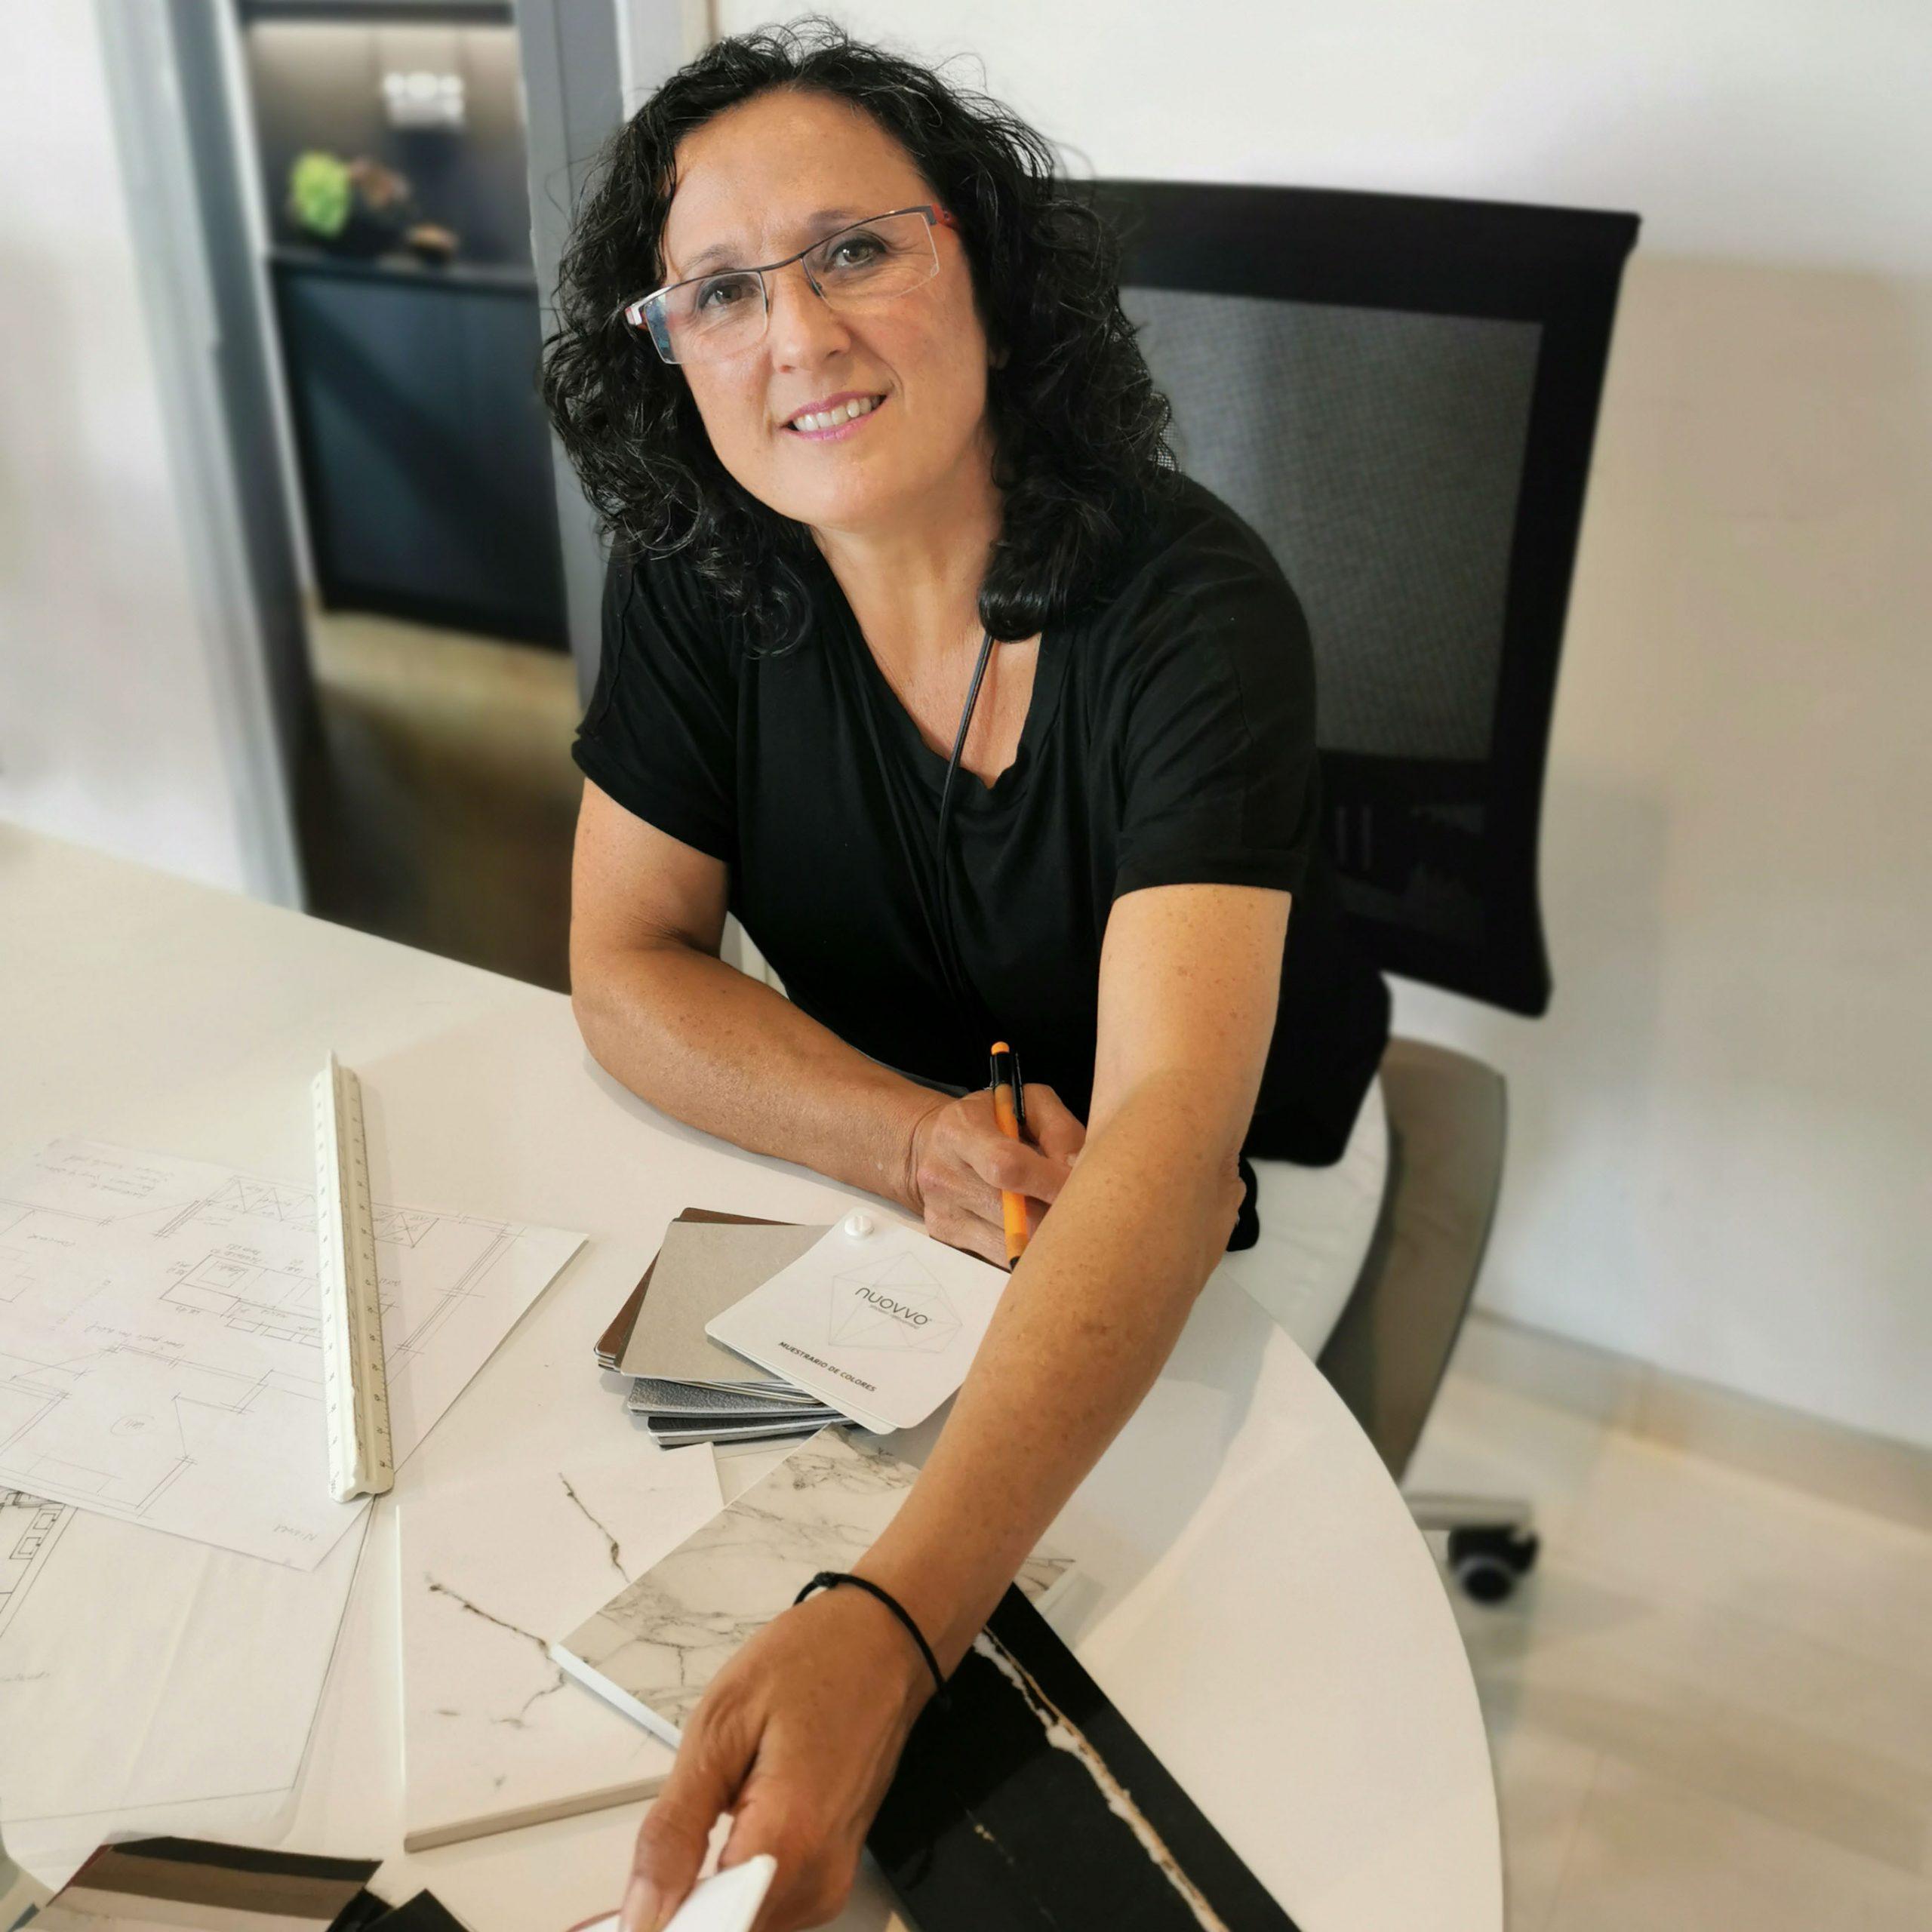 https://www.maecocina.es/wp-content/uploads/2020/09/Eva-Salas-Mae-Cocina-Baiona-scaled.jpg